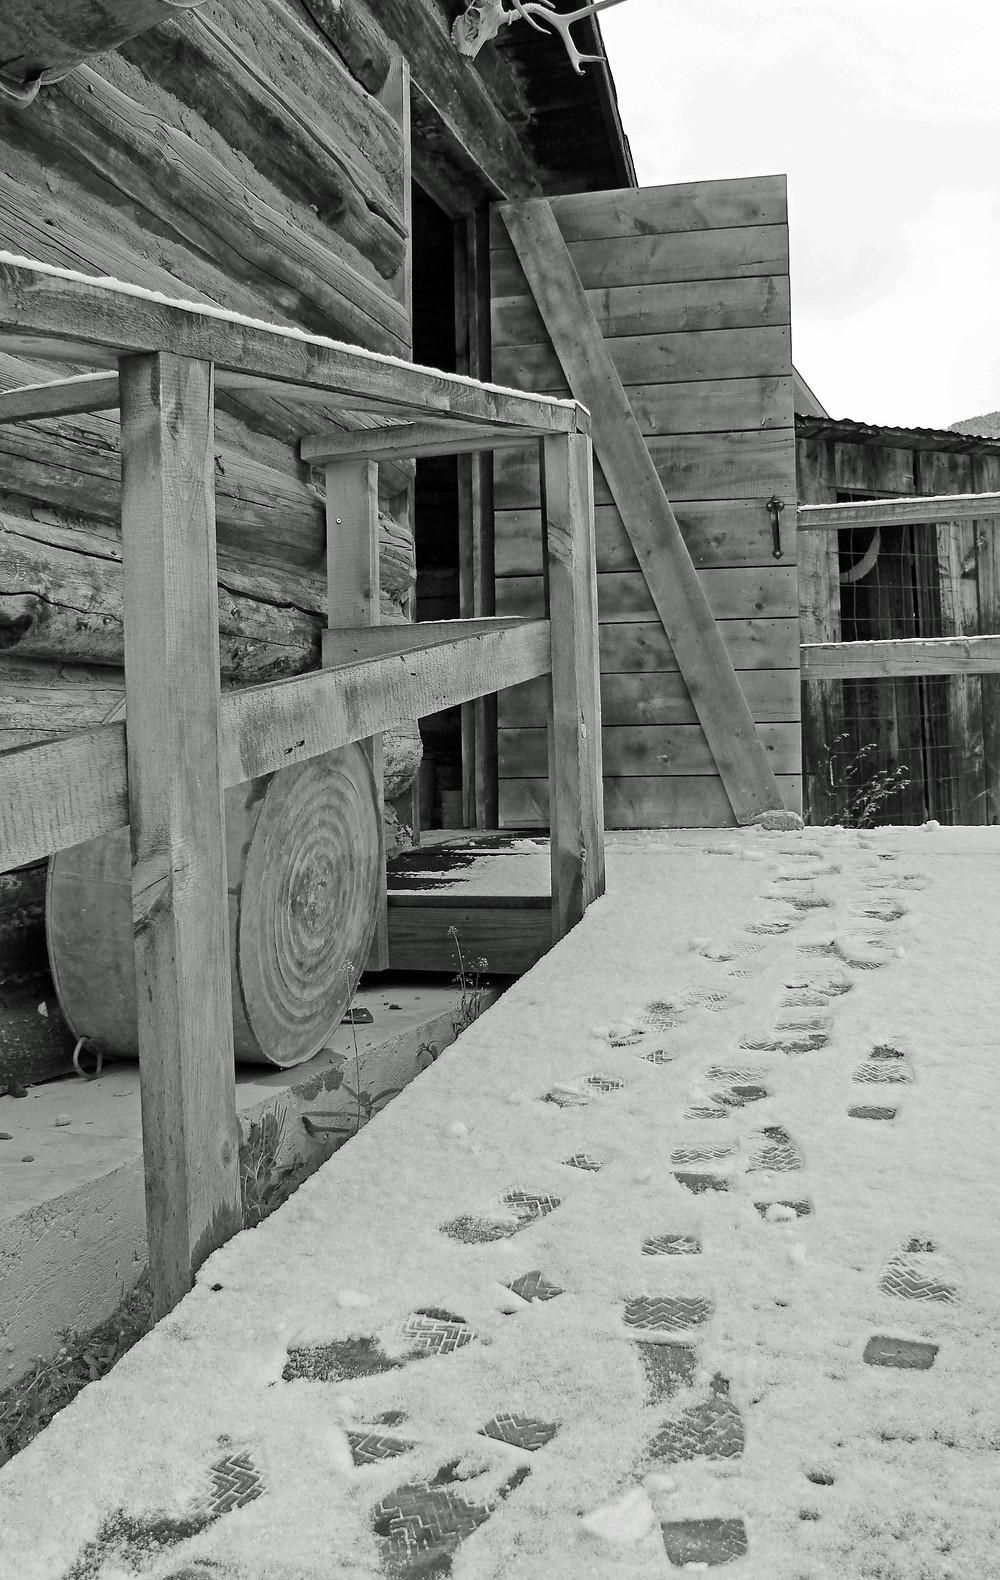 miners cabin snow bw.jpg